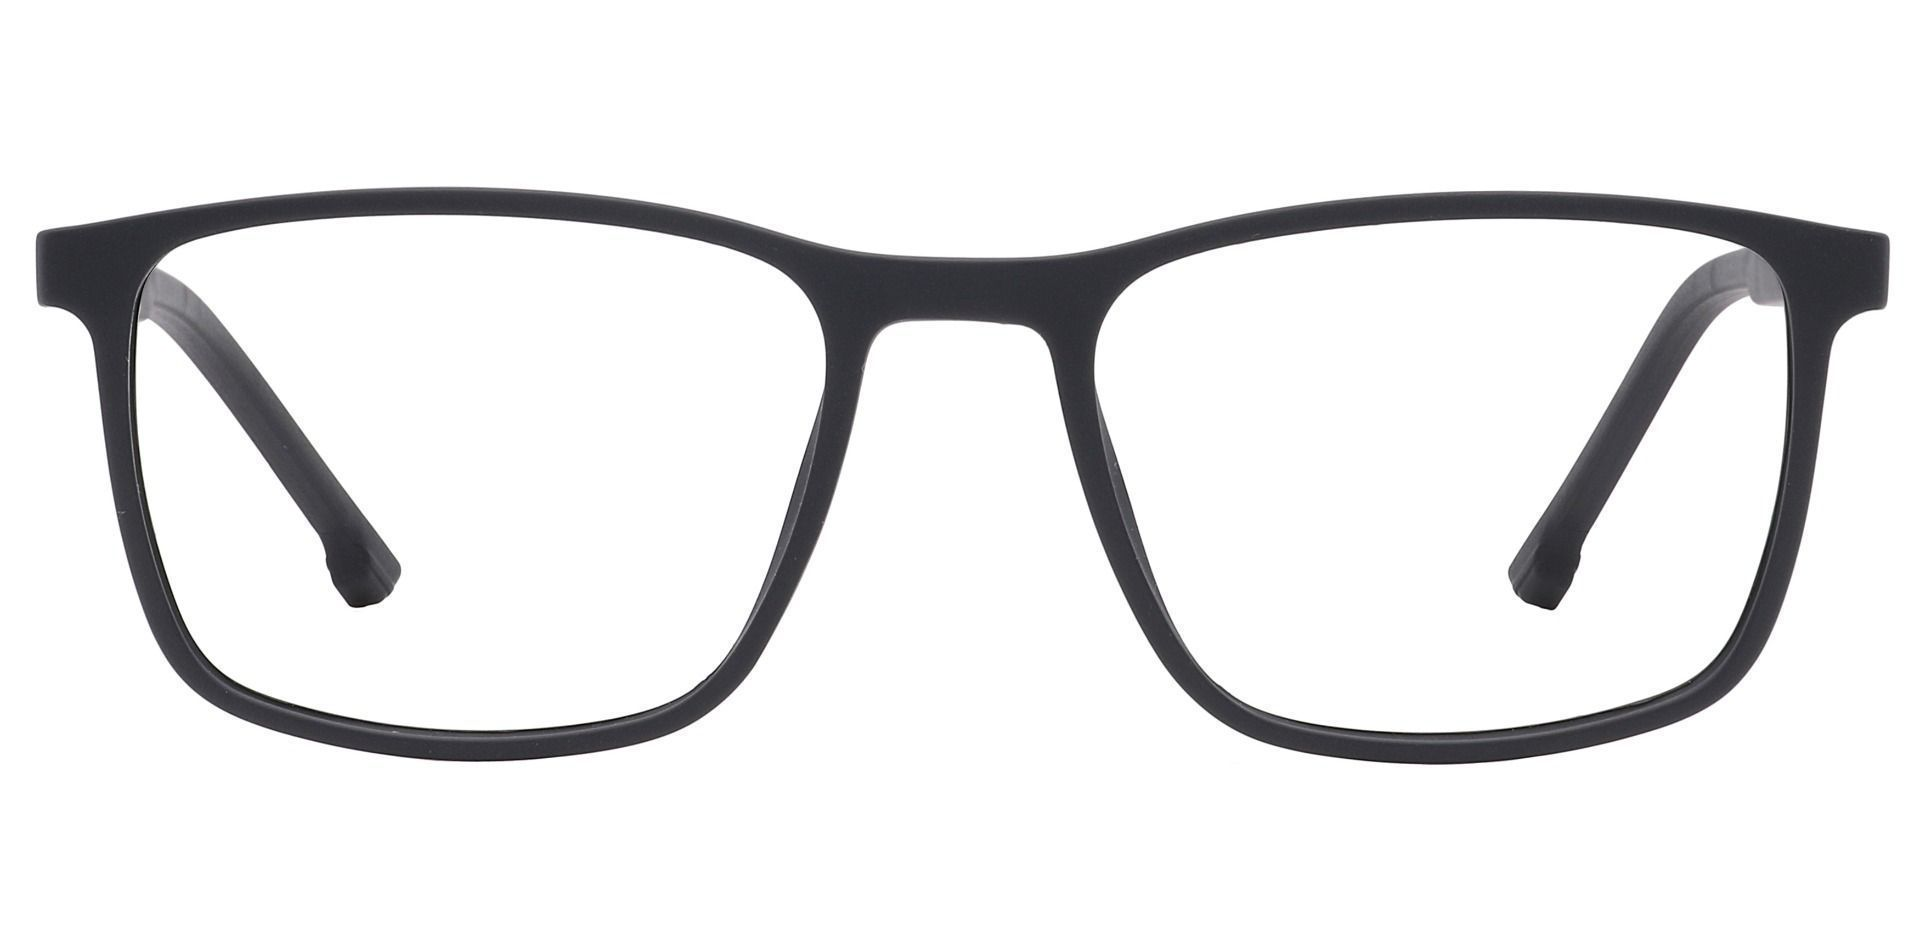 Franklin Rectangle Prescription Glasses -   Matte Black